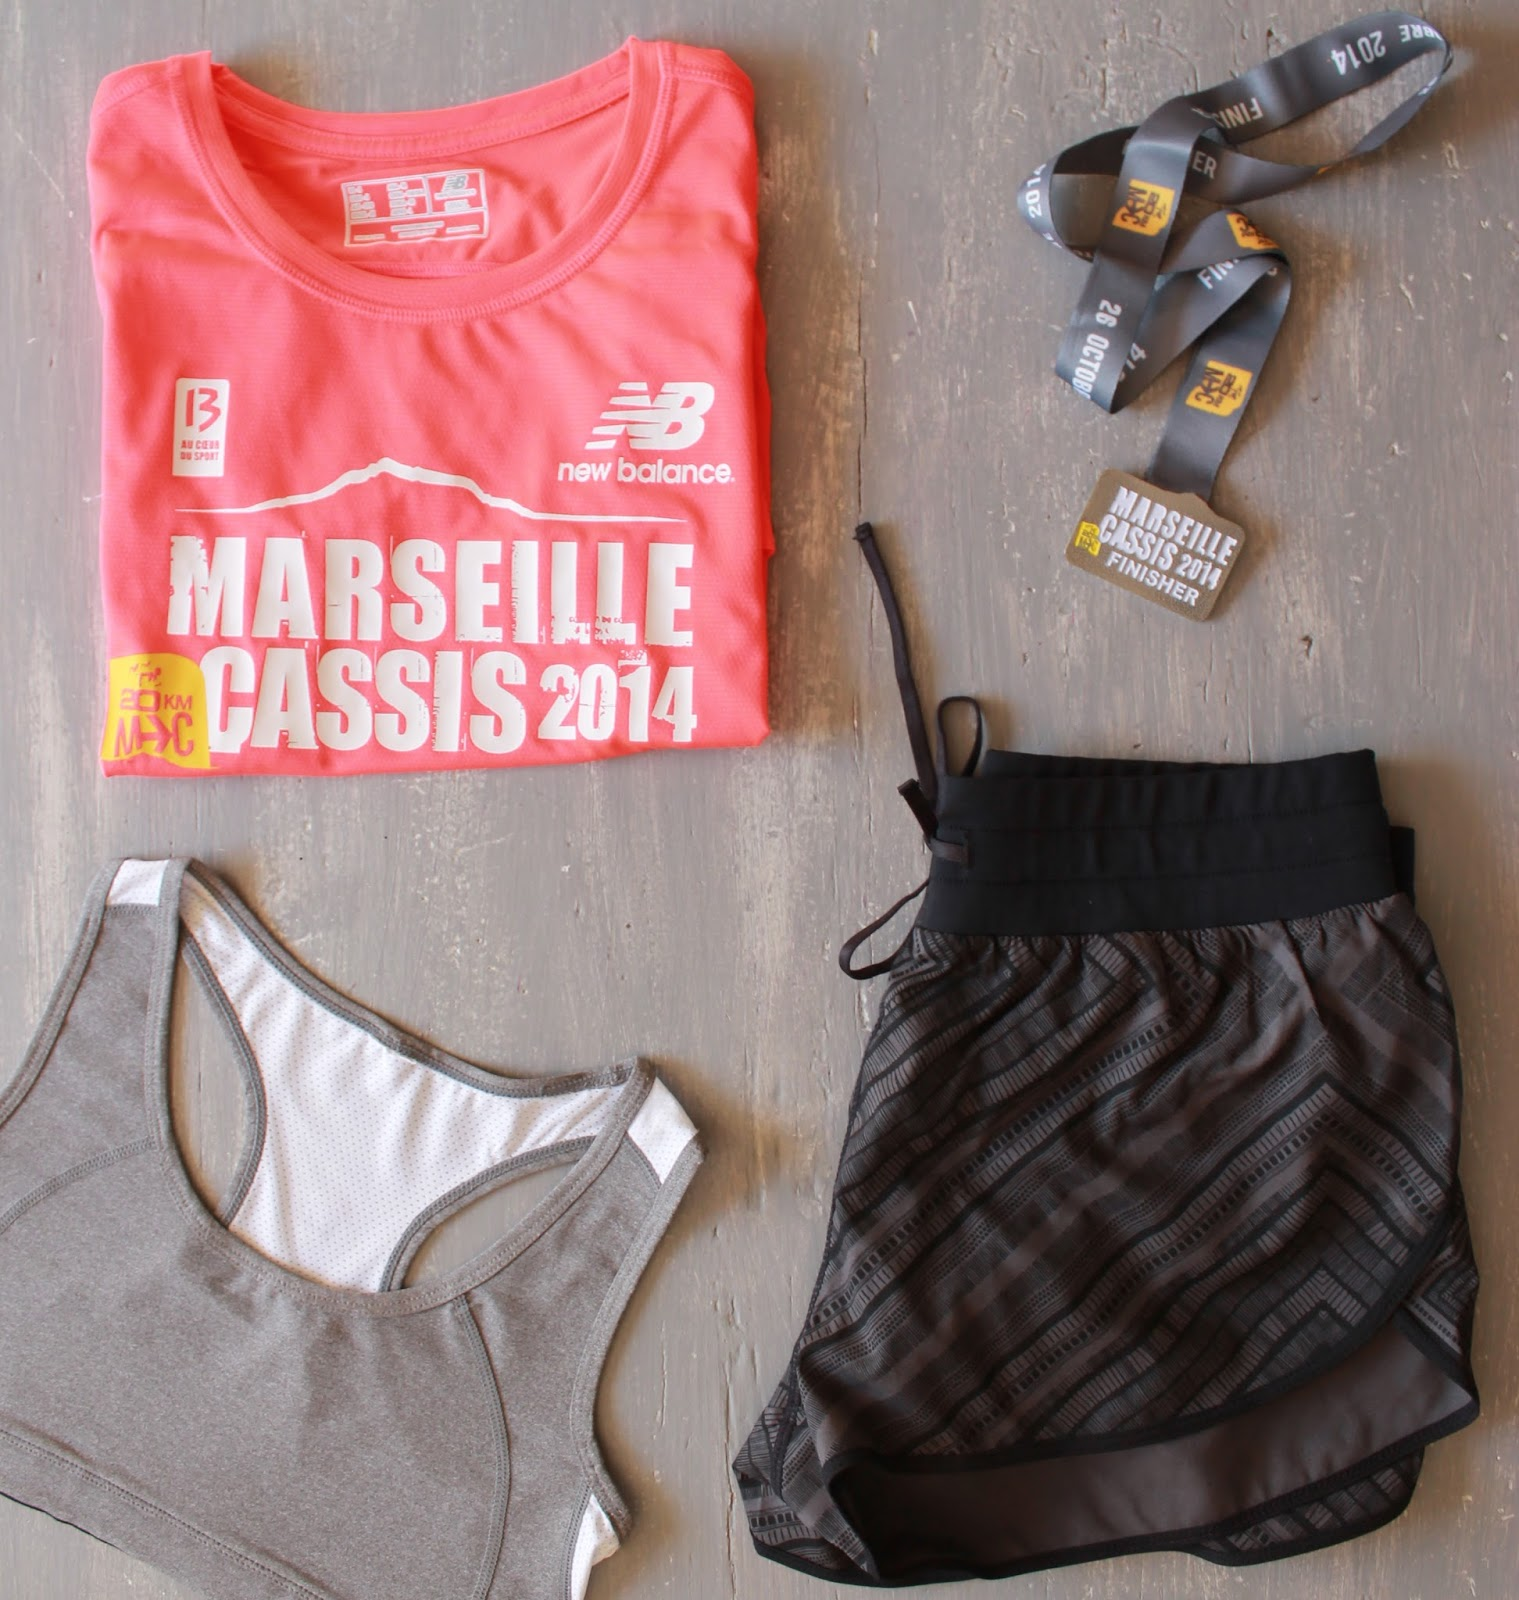 Course Marseille Cassis